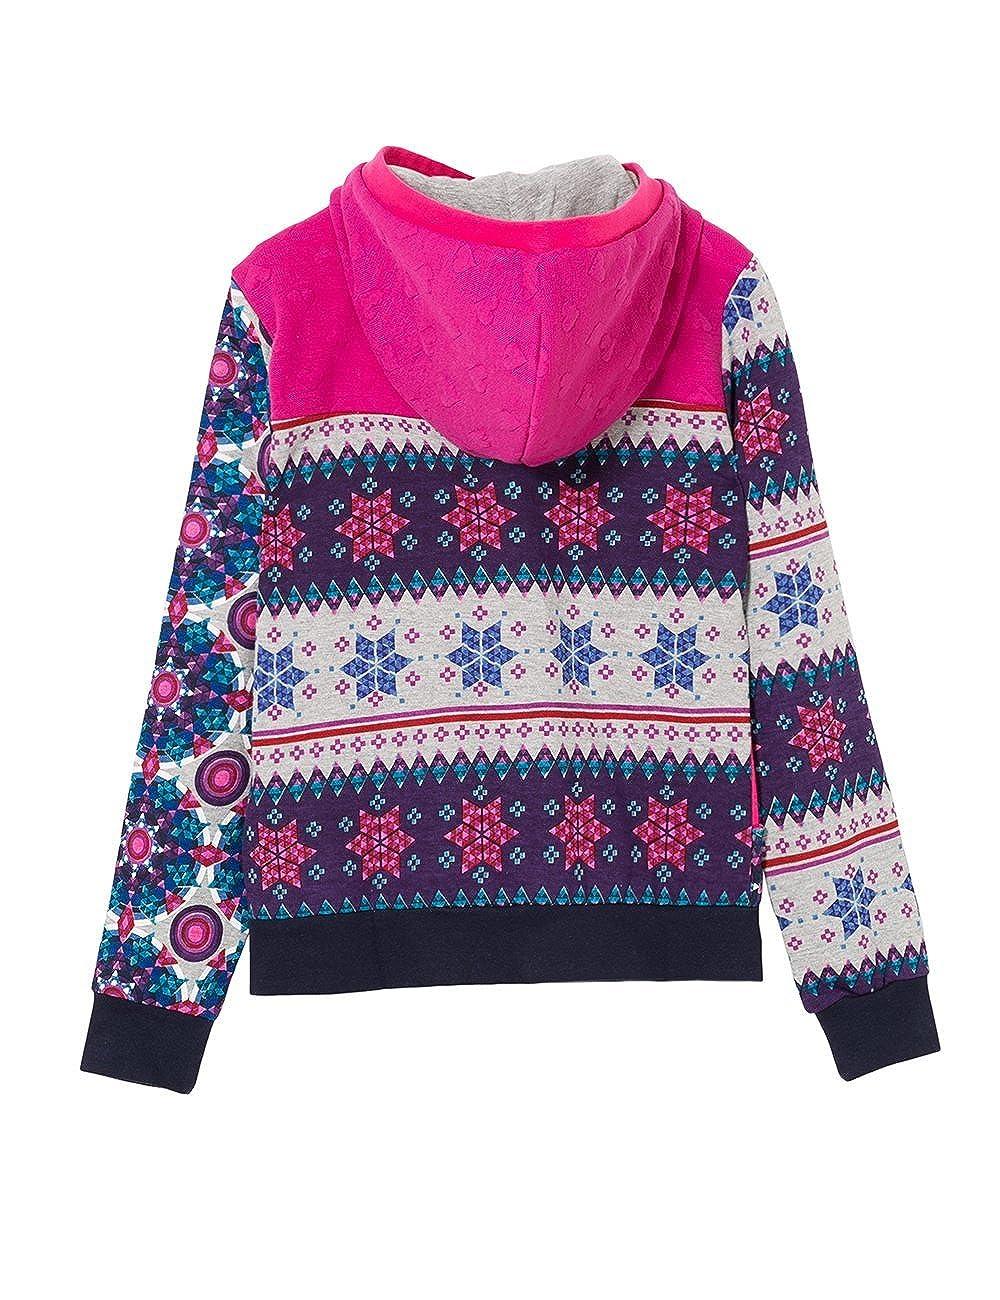 Amazon.com: Desigual Big Girls Sweater Becket, Fuchsia Rose, 7/8: Clothing